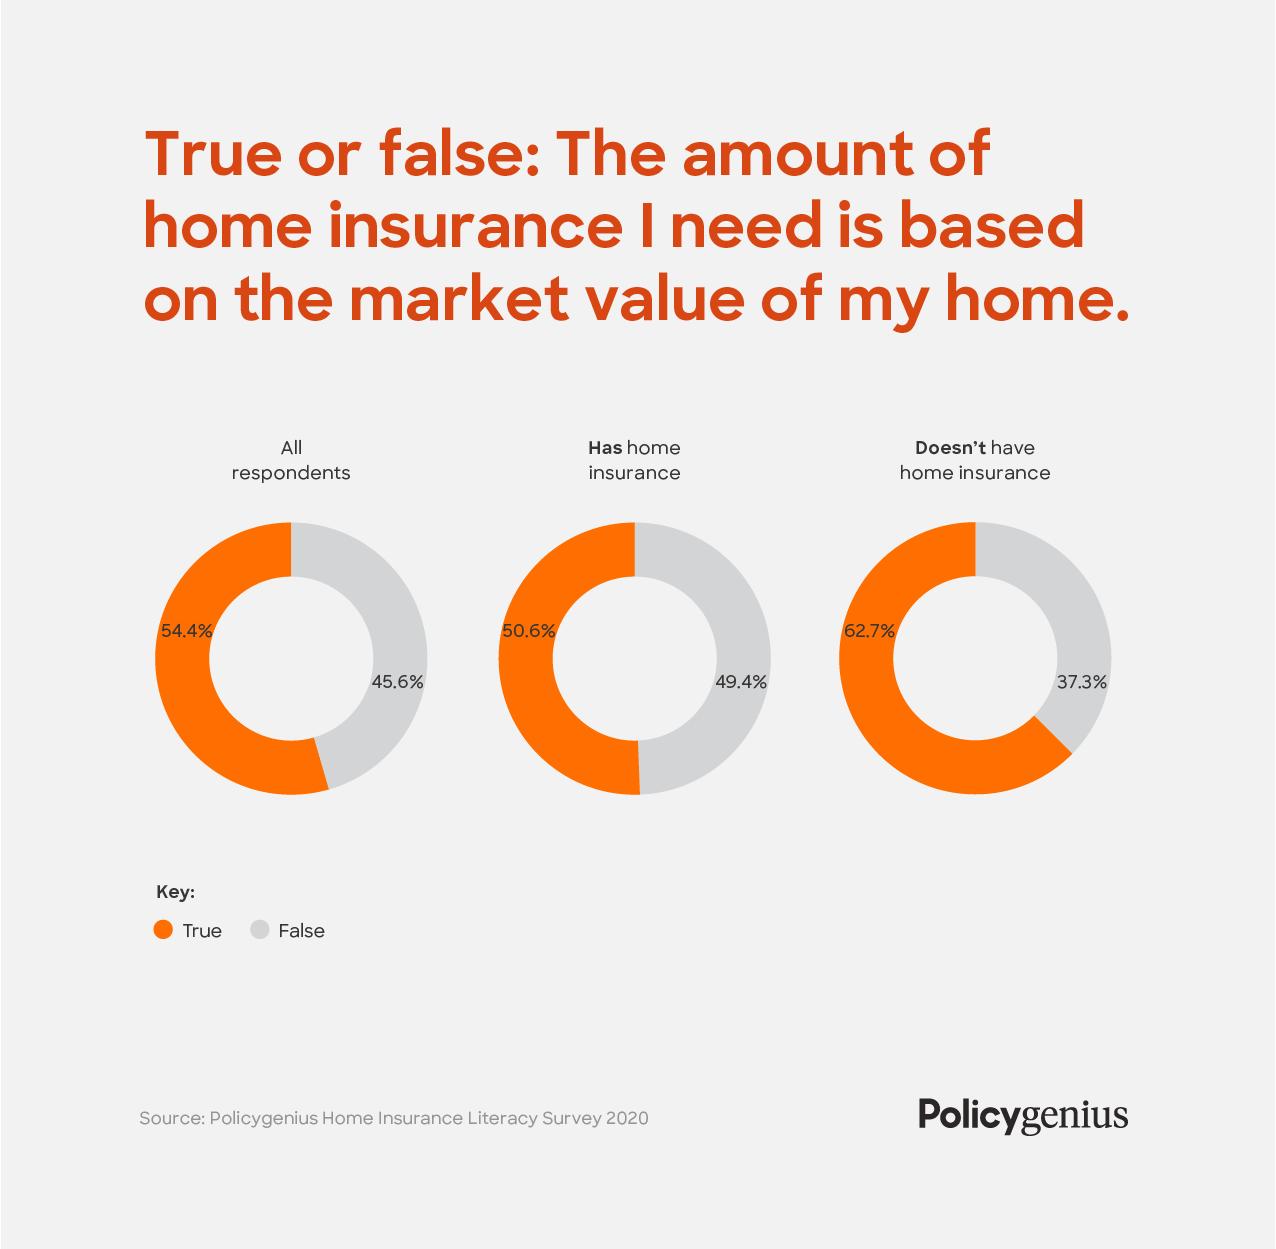 Home Insurance Literacy Survey 2020 | Policygenius